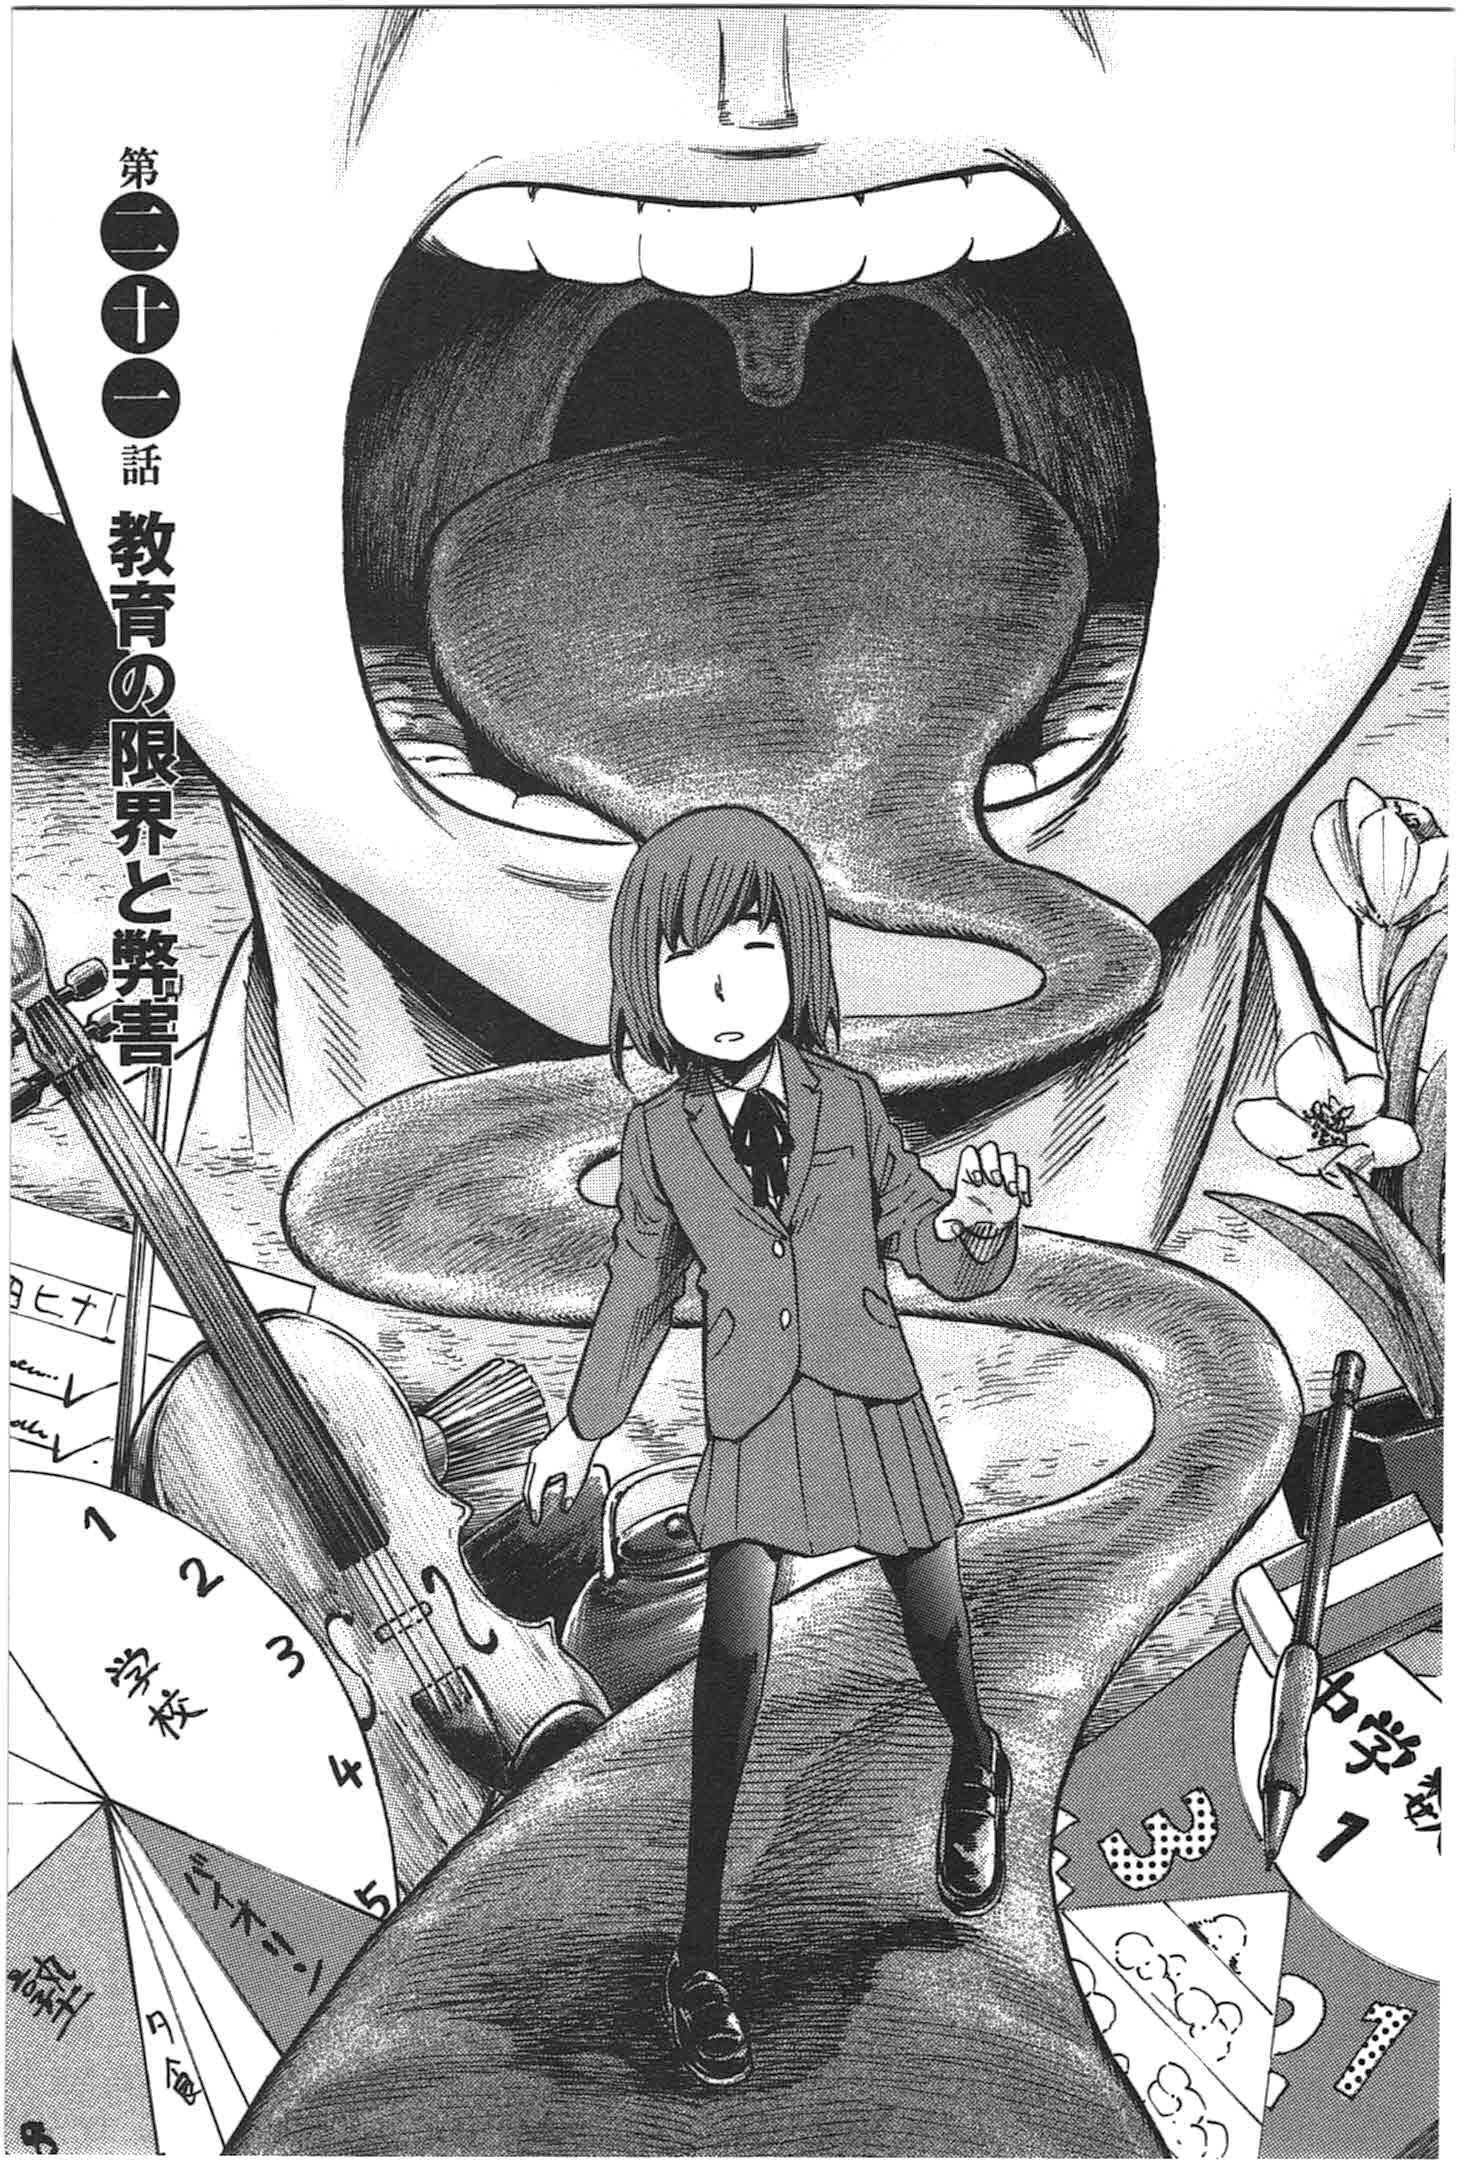 Chapter 21 Cover.jpg